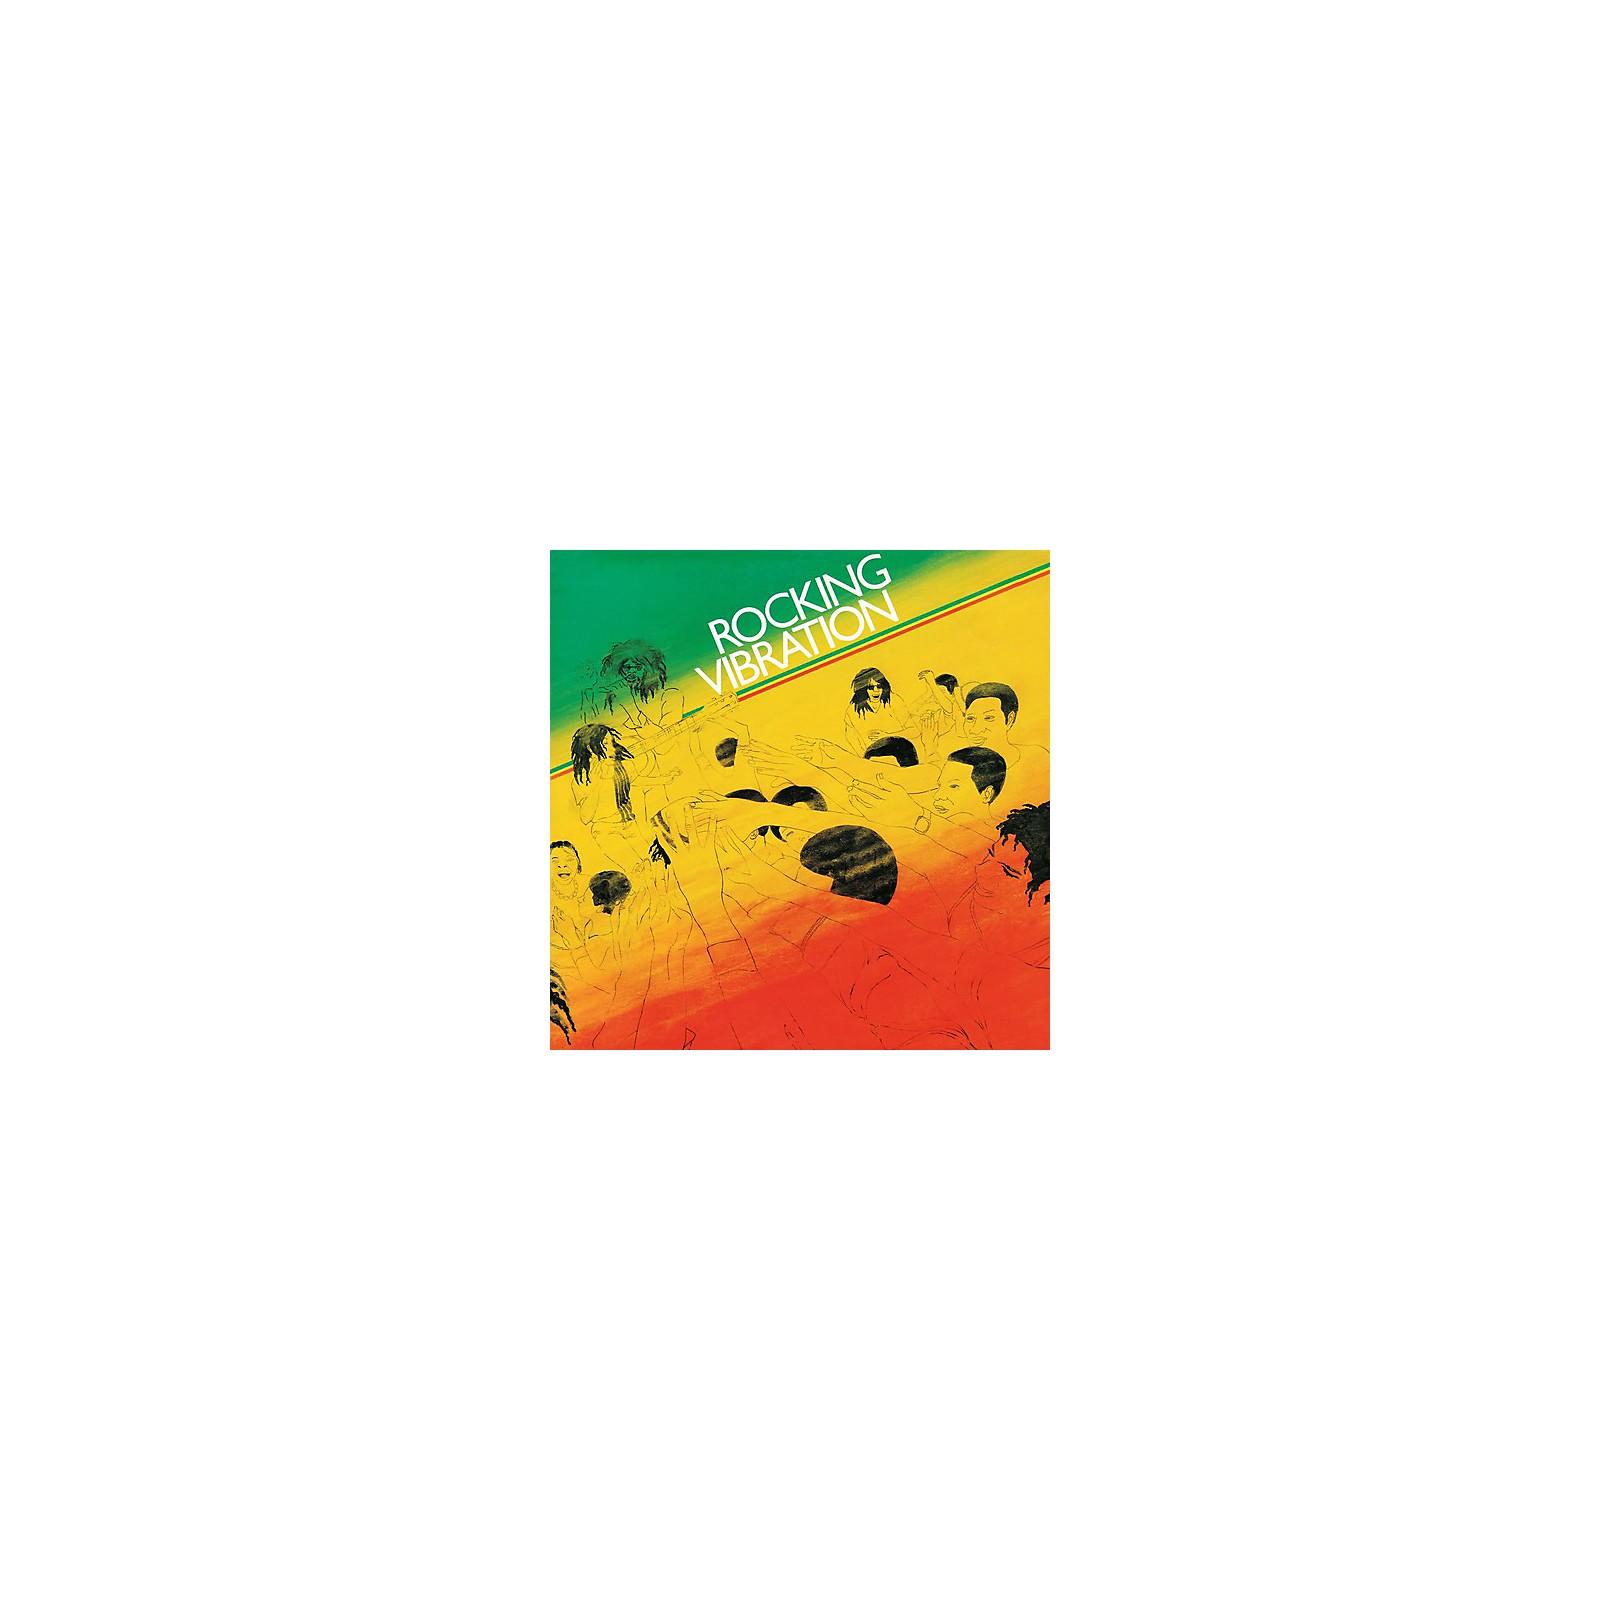 Alliance Linval Thompson - Rocking Vibration